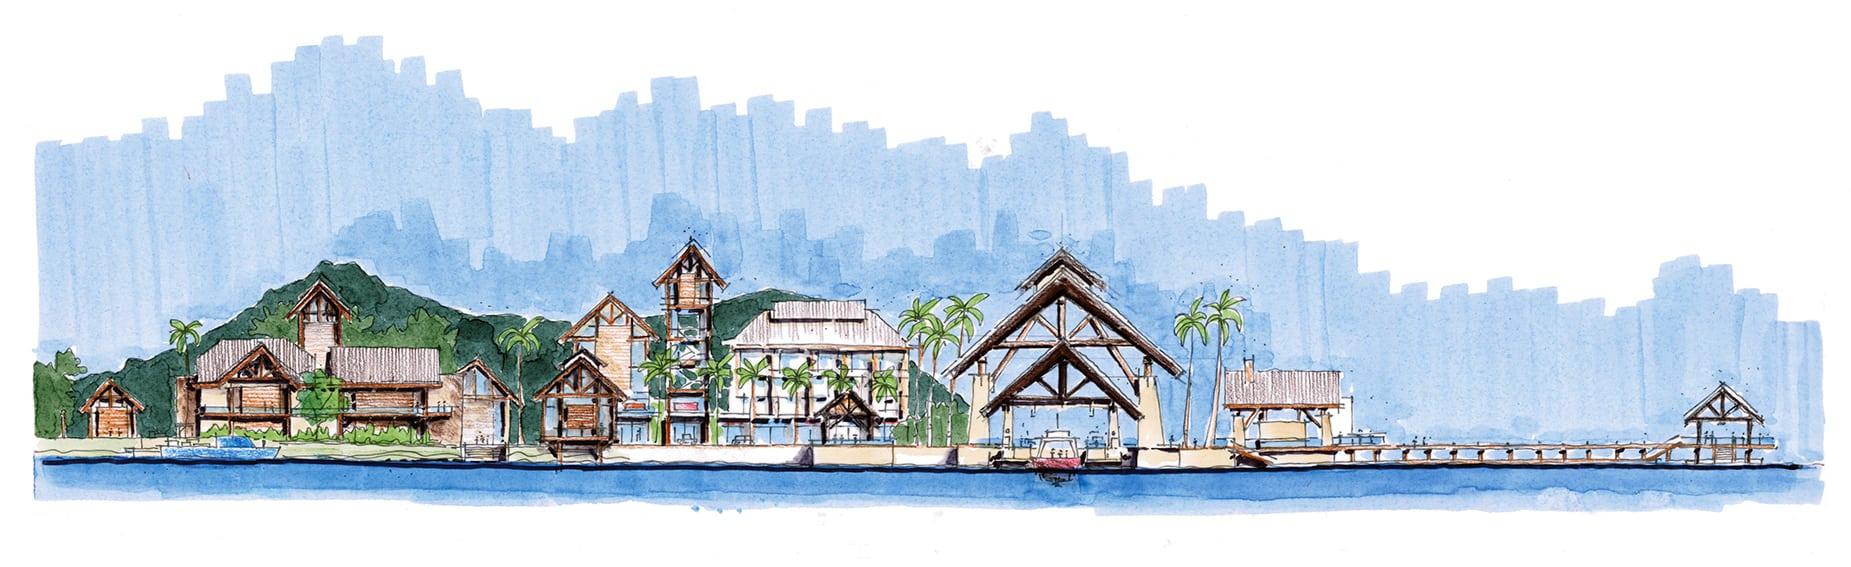 EC88 Hon Thi Island_elevation_casino, village center, lobby, marinaEKISTICS